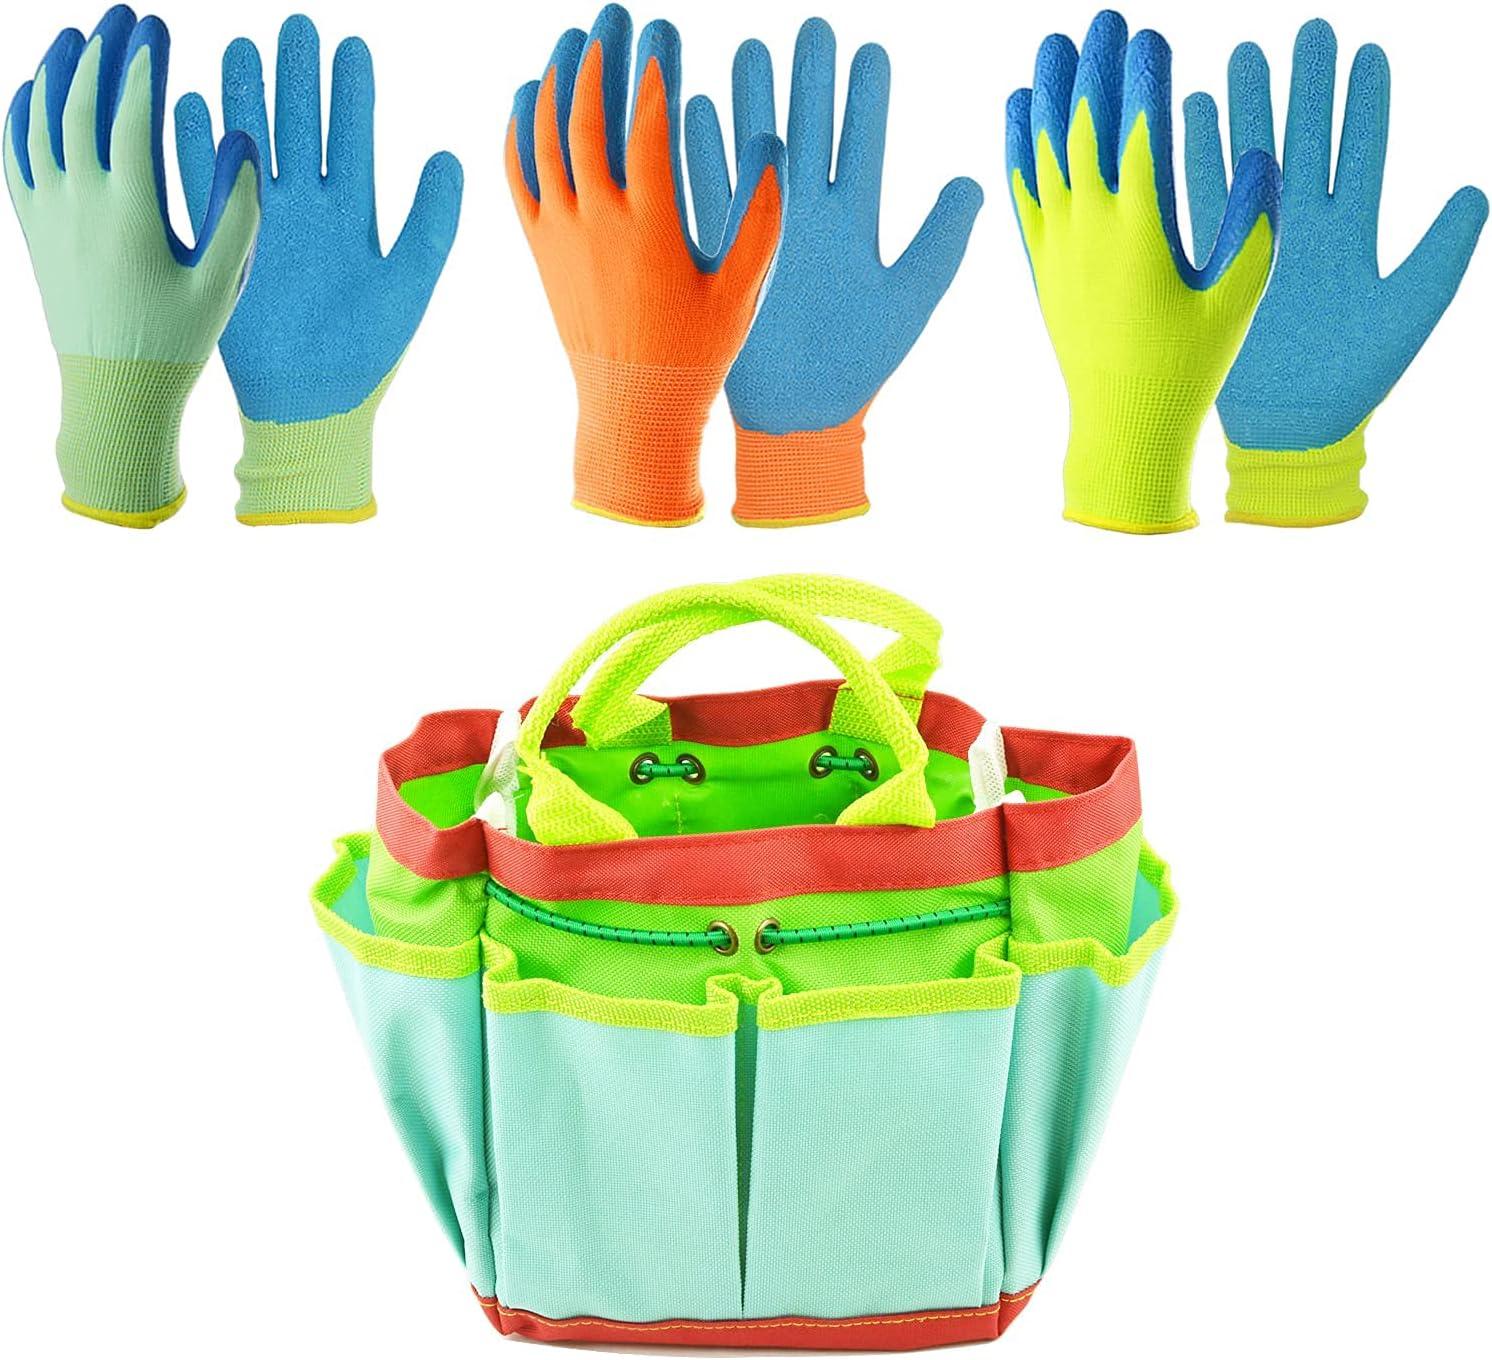 GLOSAV Kids Gardening Gloves Size Opening large release sale 2021 new 3 Pairs Stora